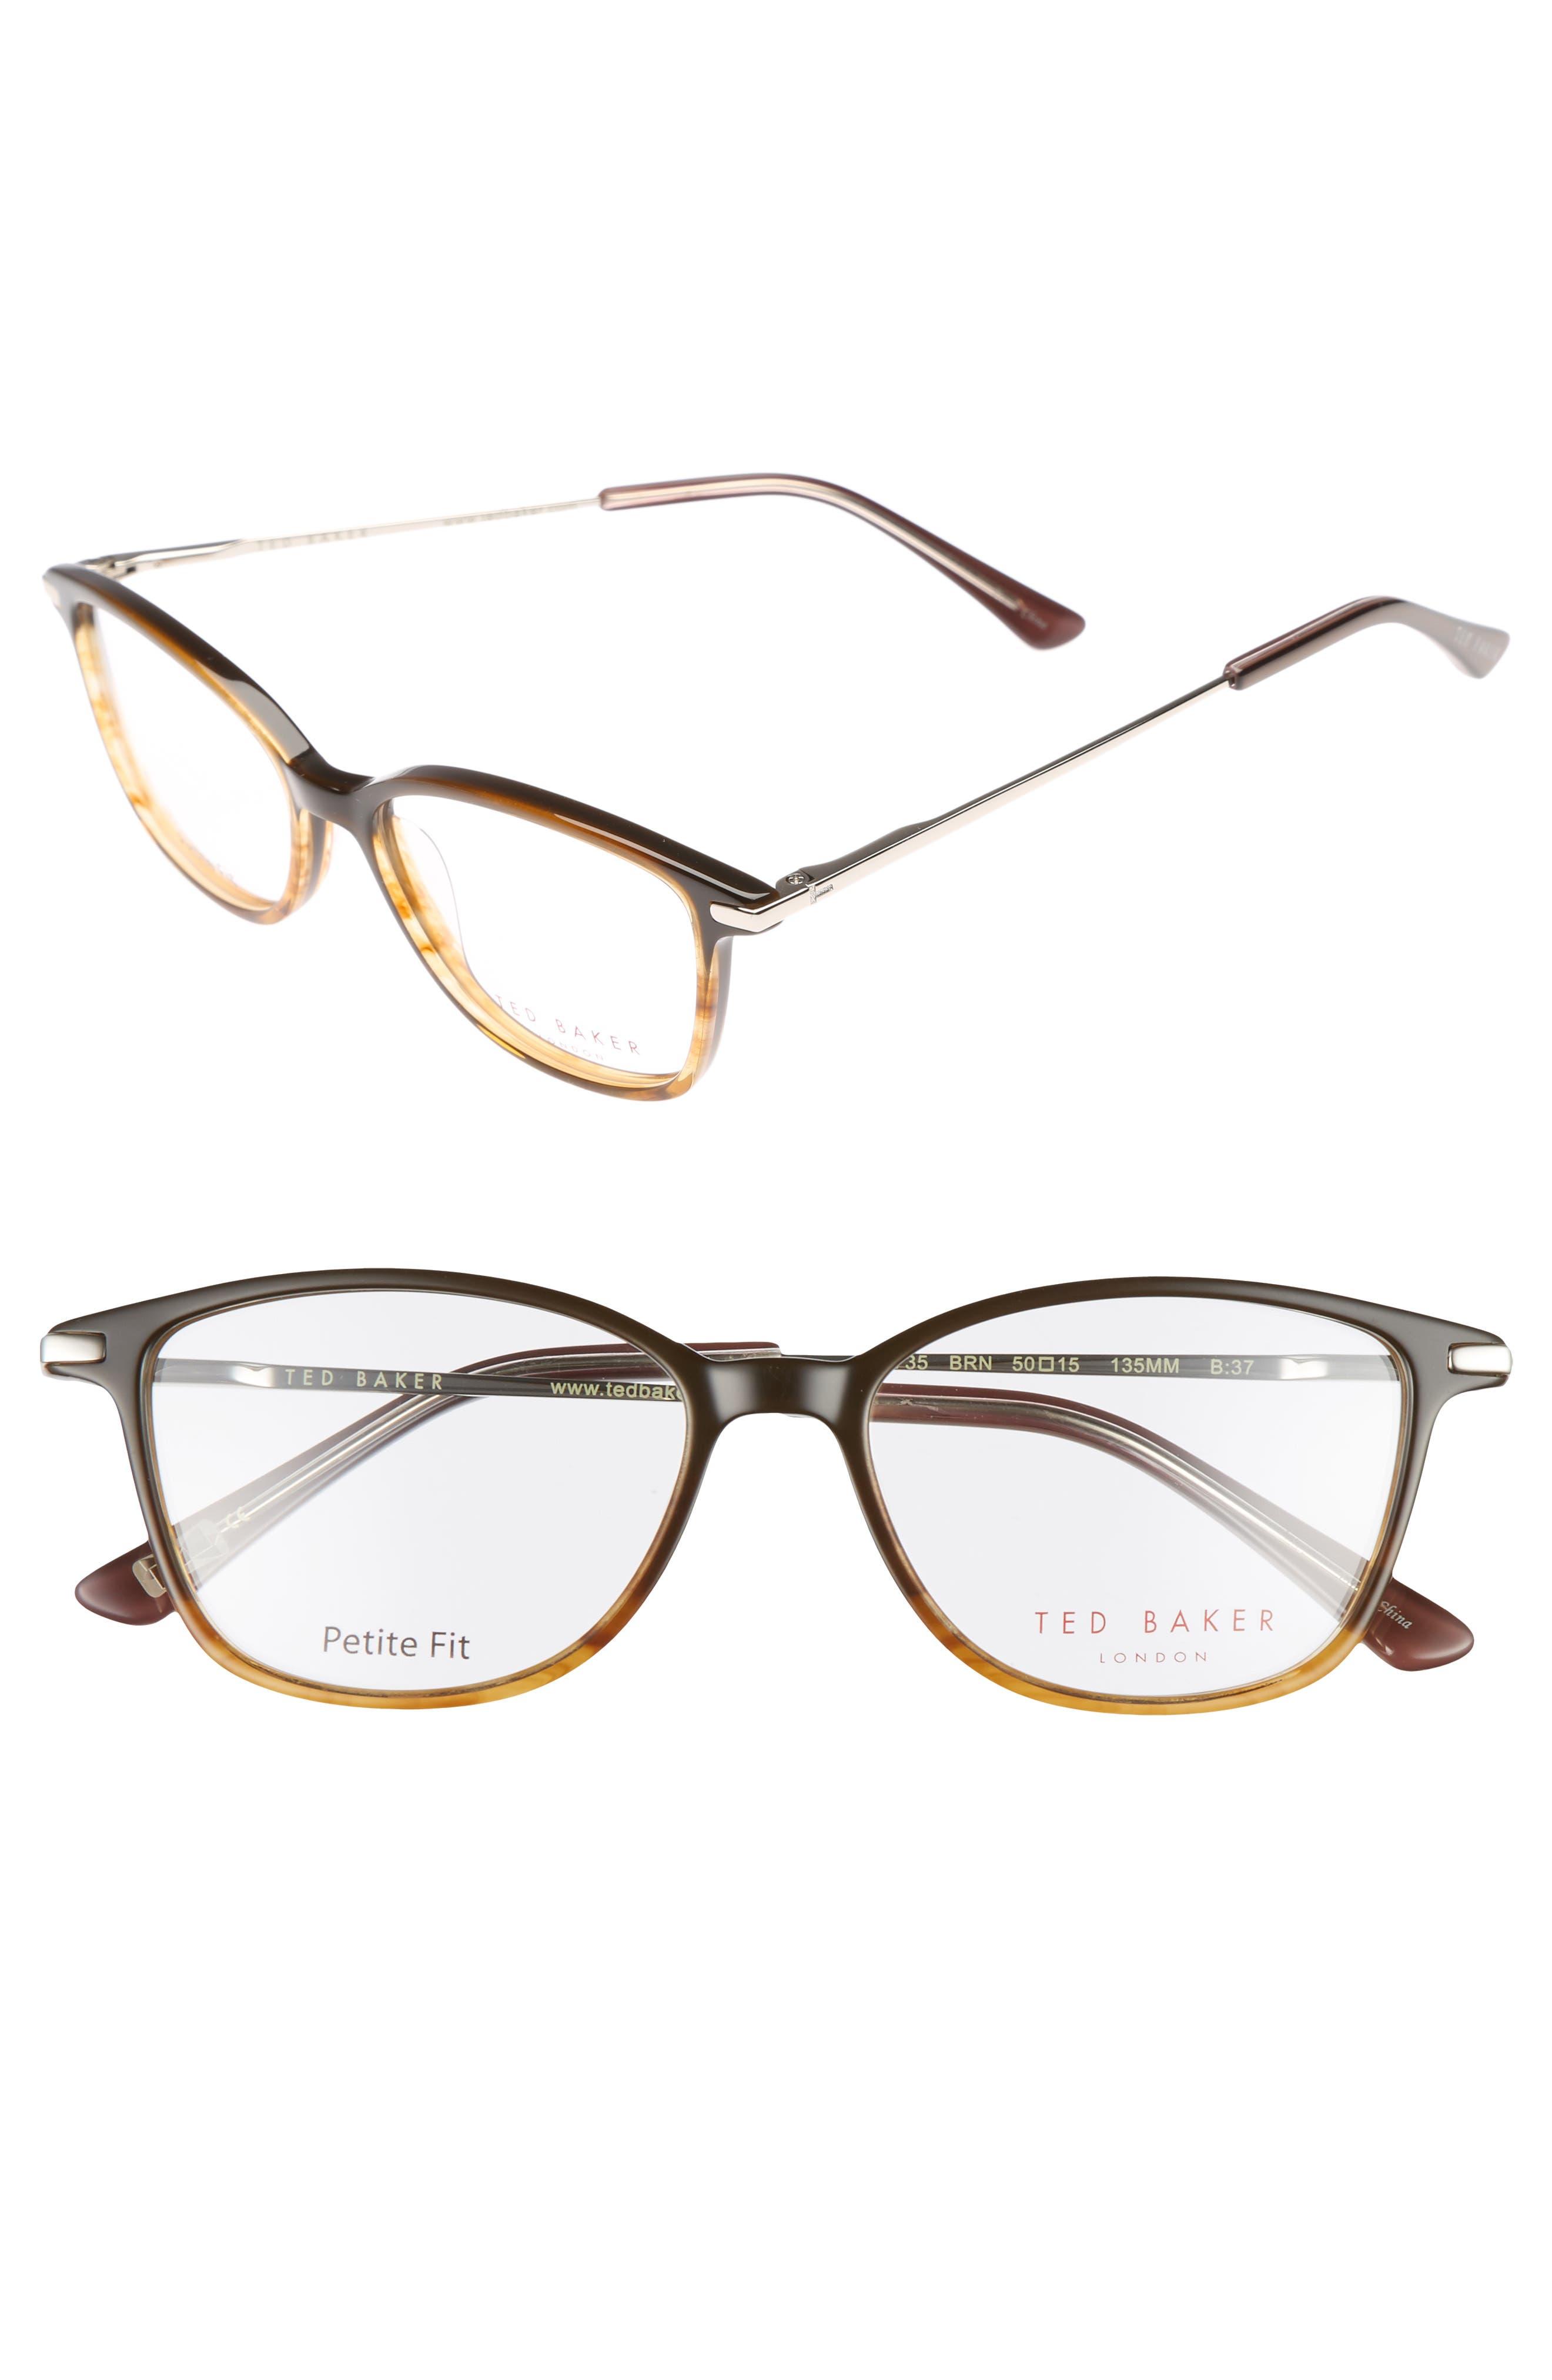 Petite Fit 50mm Optical Glasses,                             Main thumbnail 1, color,